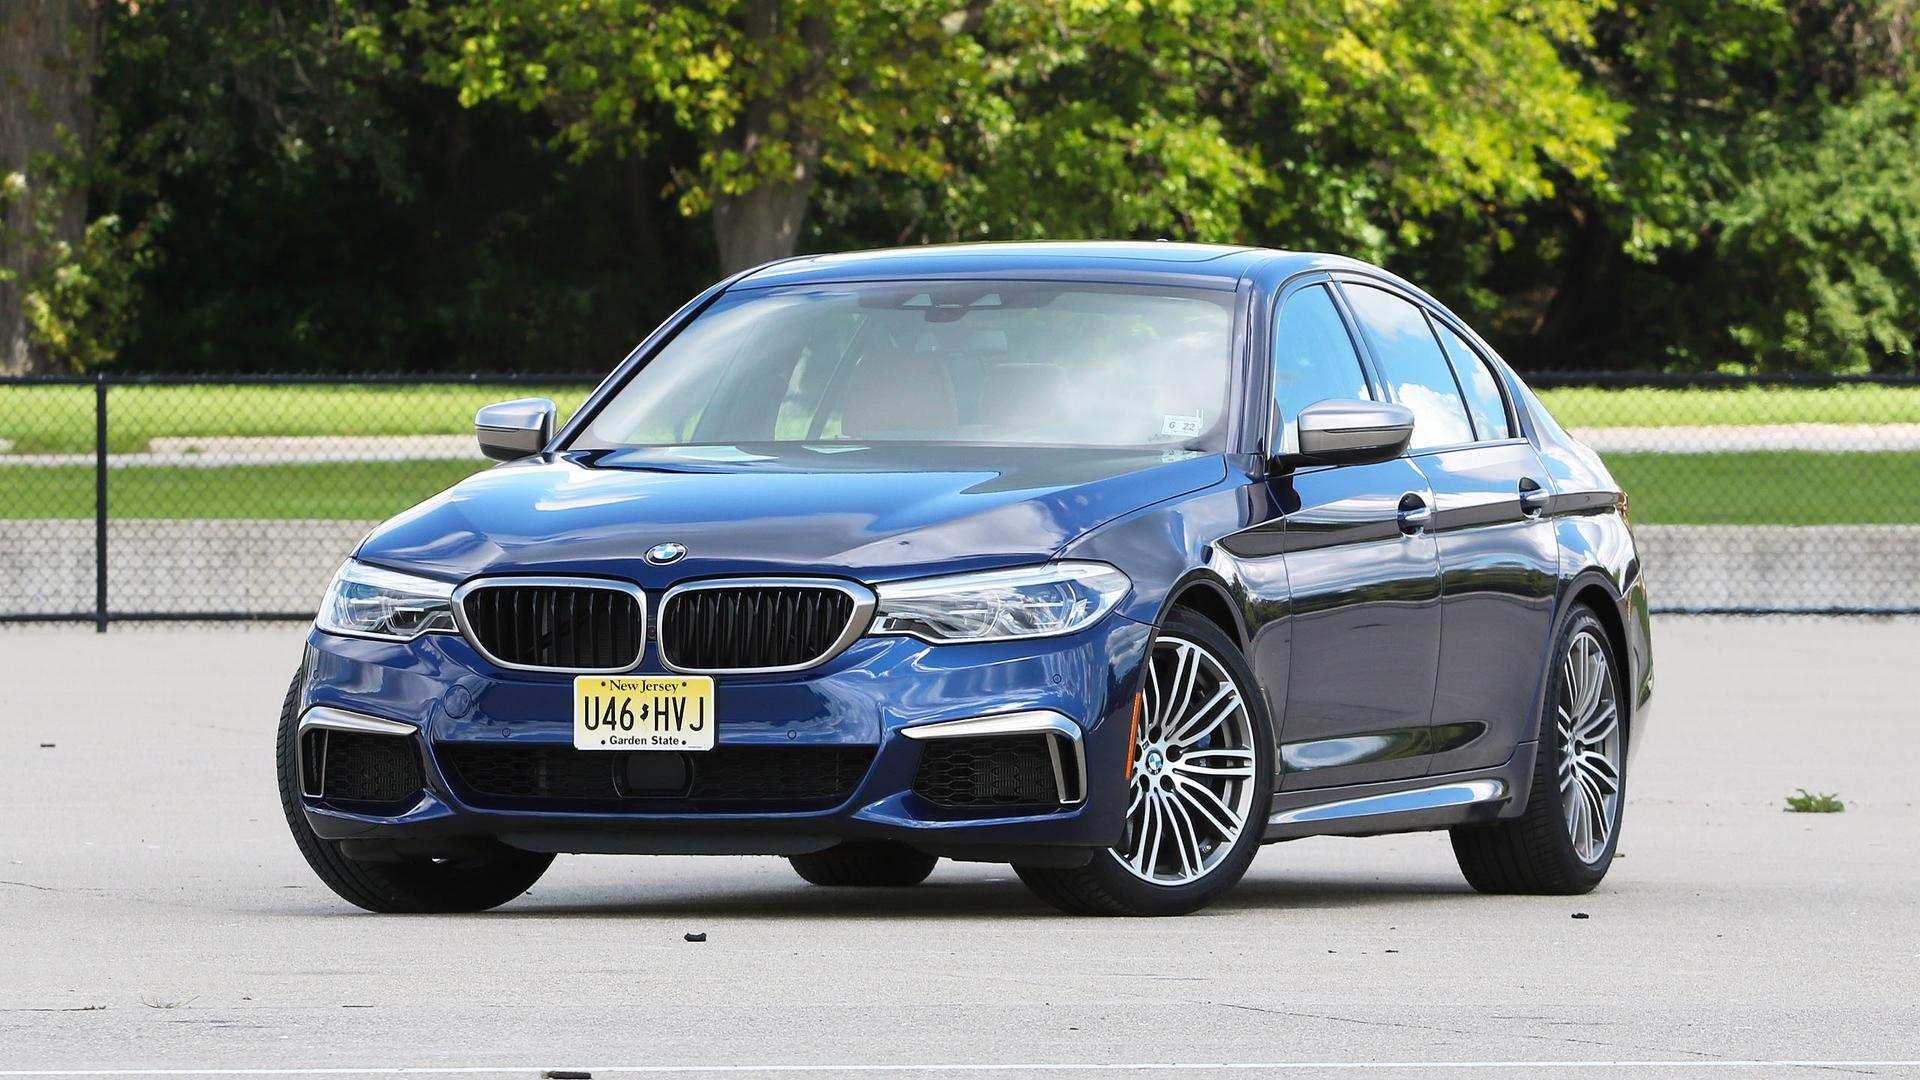 15 The BMW 5 Series Update 2020 Interior by BMW 5 Series Update 2020